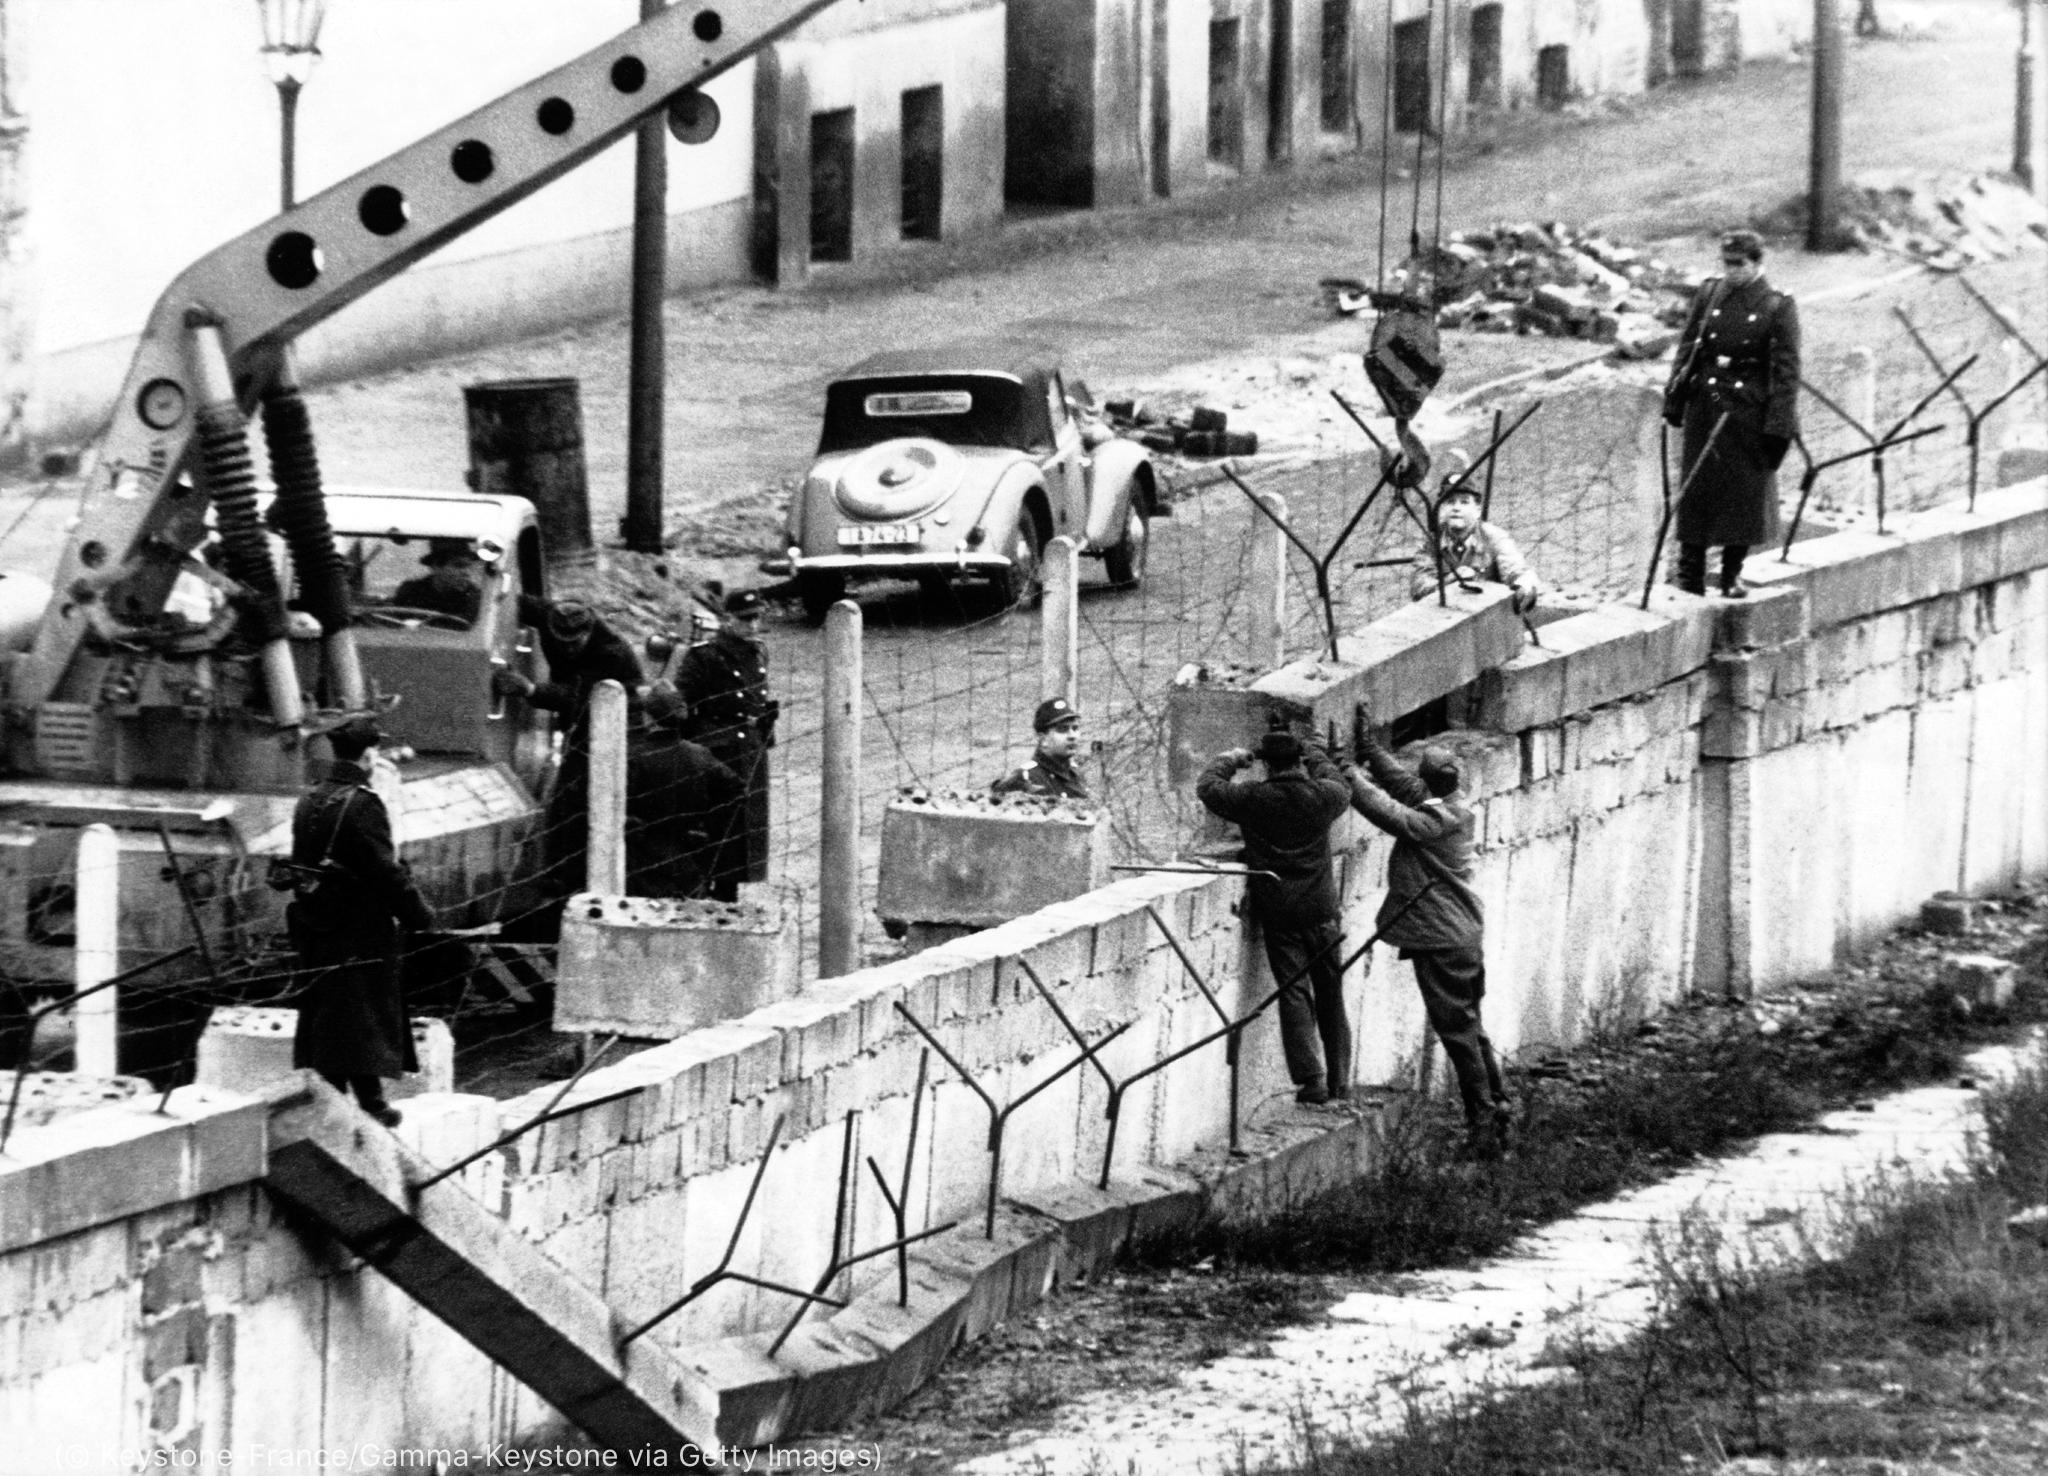 Workers fortifying wall (© Keystone-France/Gamma-Keystone via Getty Images)